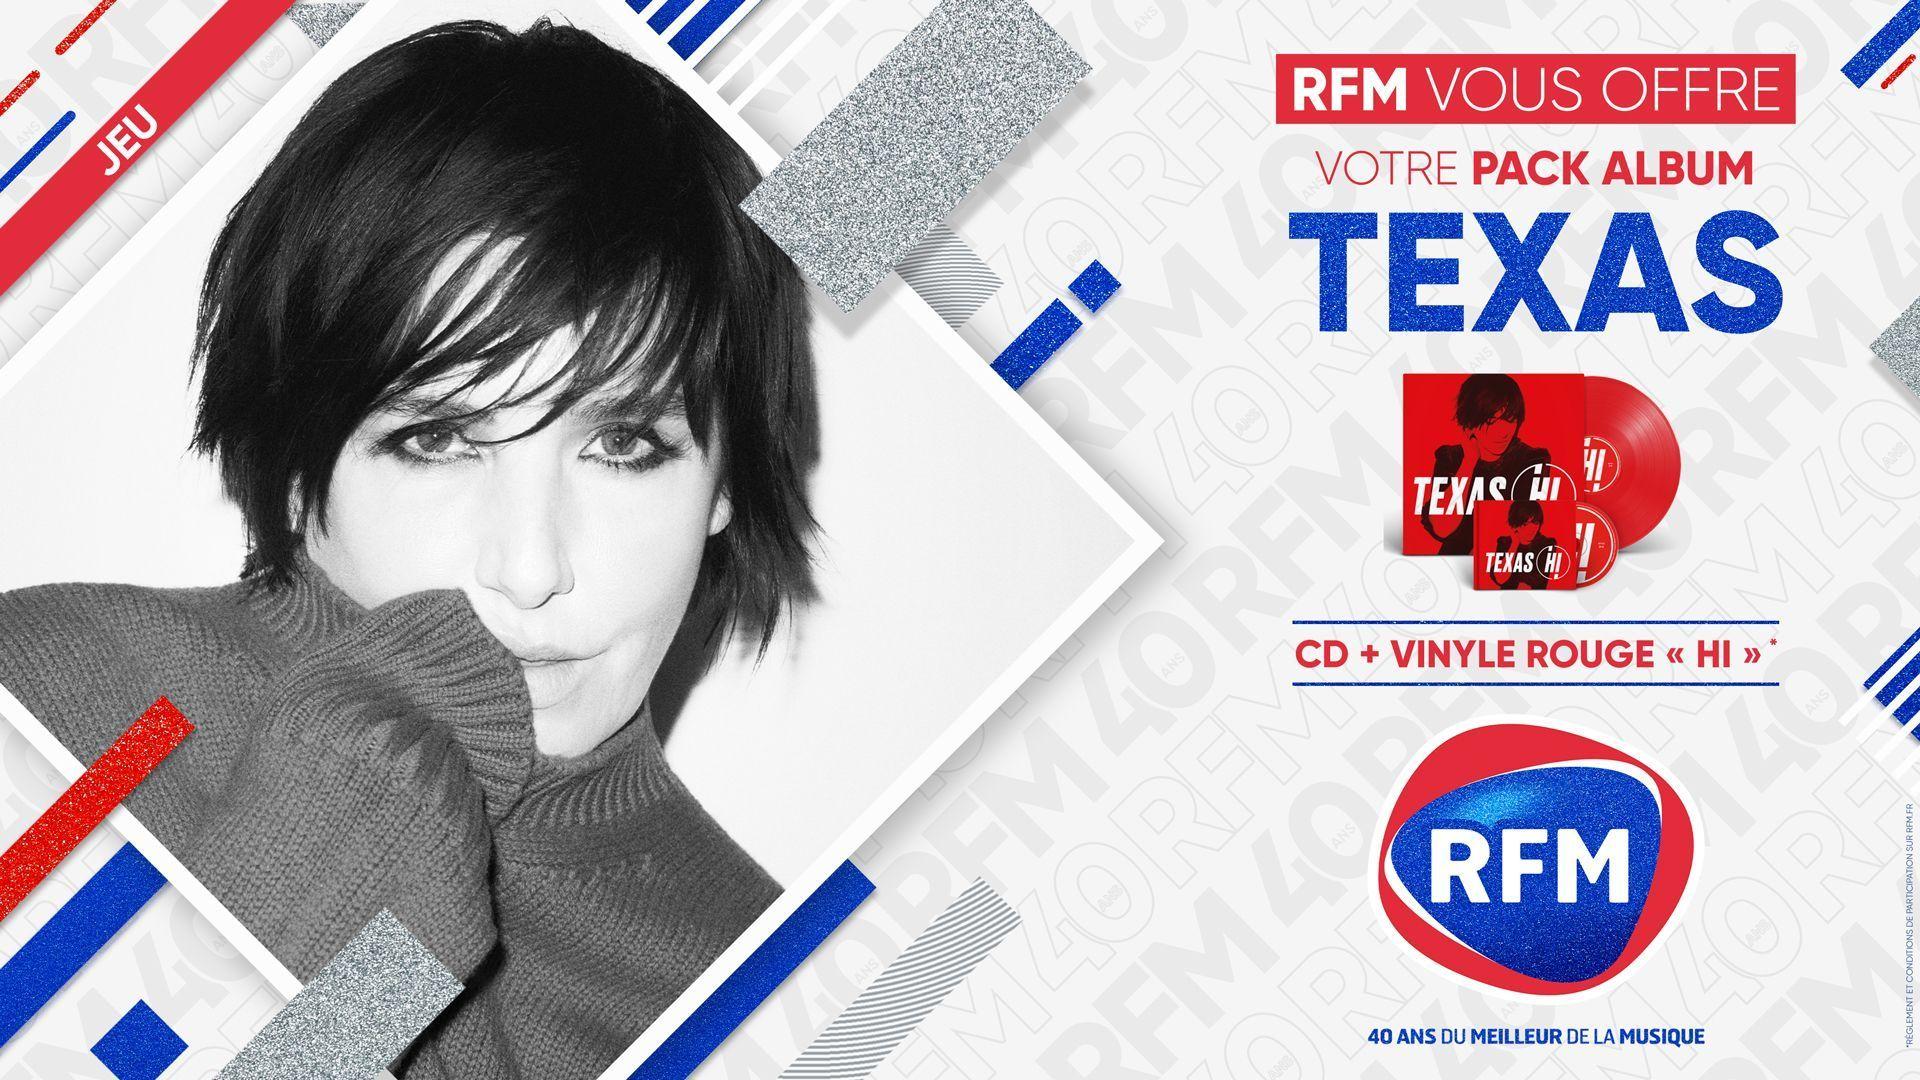 "Code promo RFM : Des packs CD + Vinyle ""Hi"" de Texas à gagner"